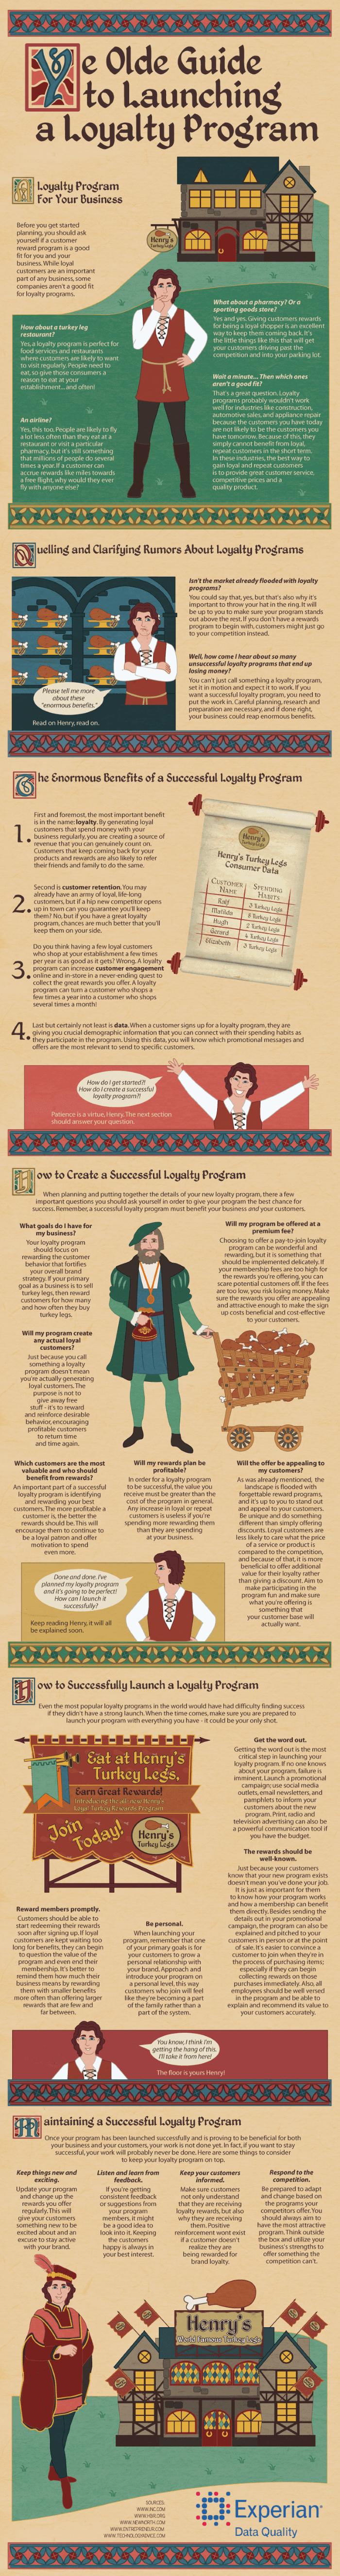 Ye olde guide to launching a loyalty program infographic business ye olde guide to launching a loyalty program infographic business colourmoves